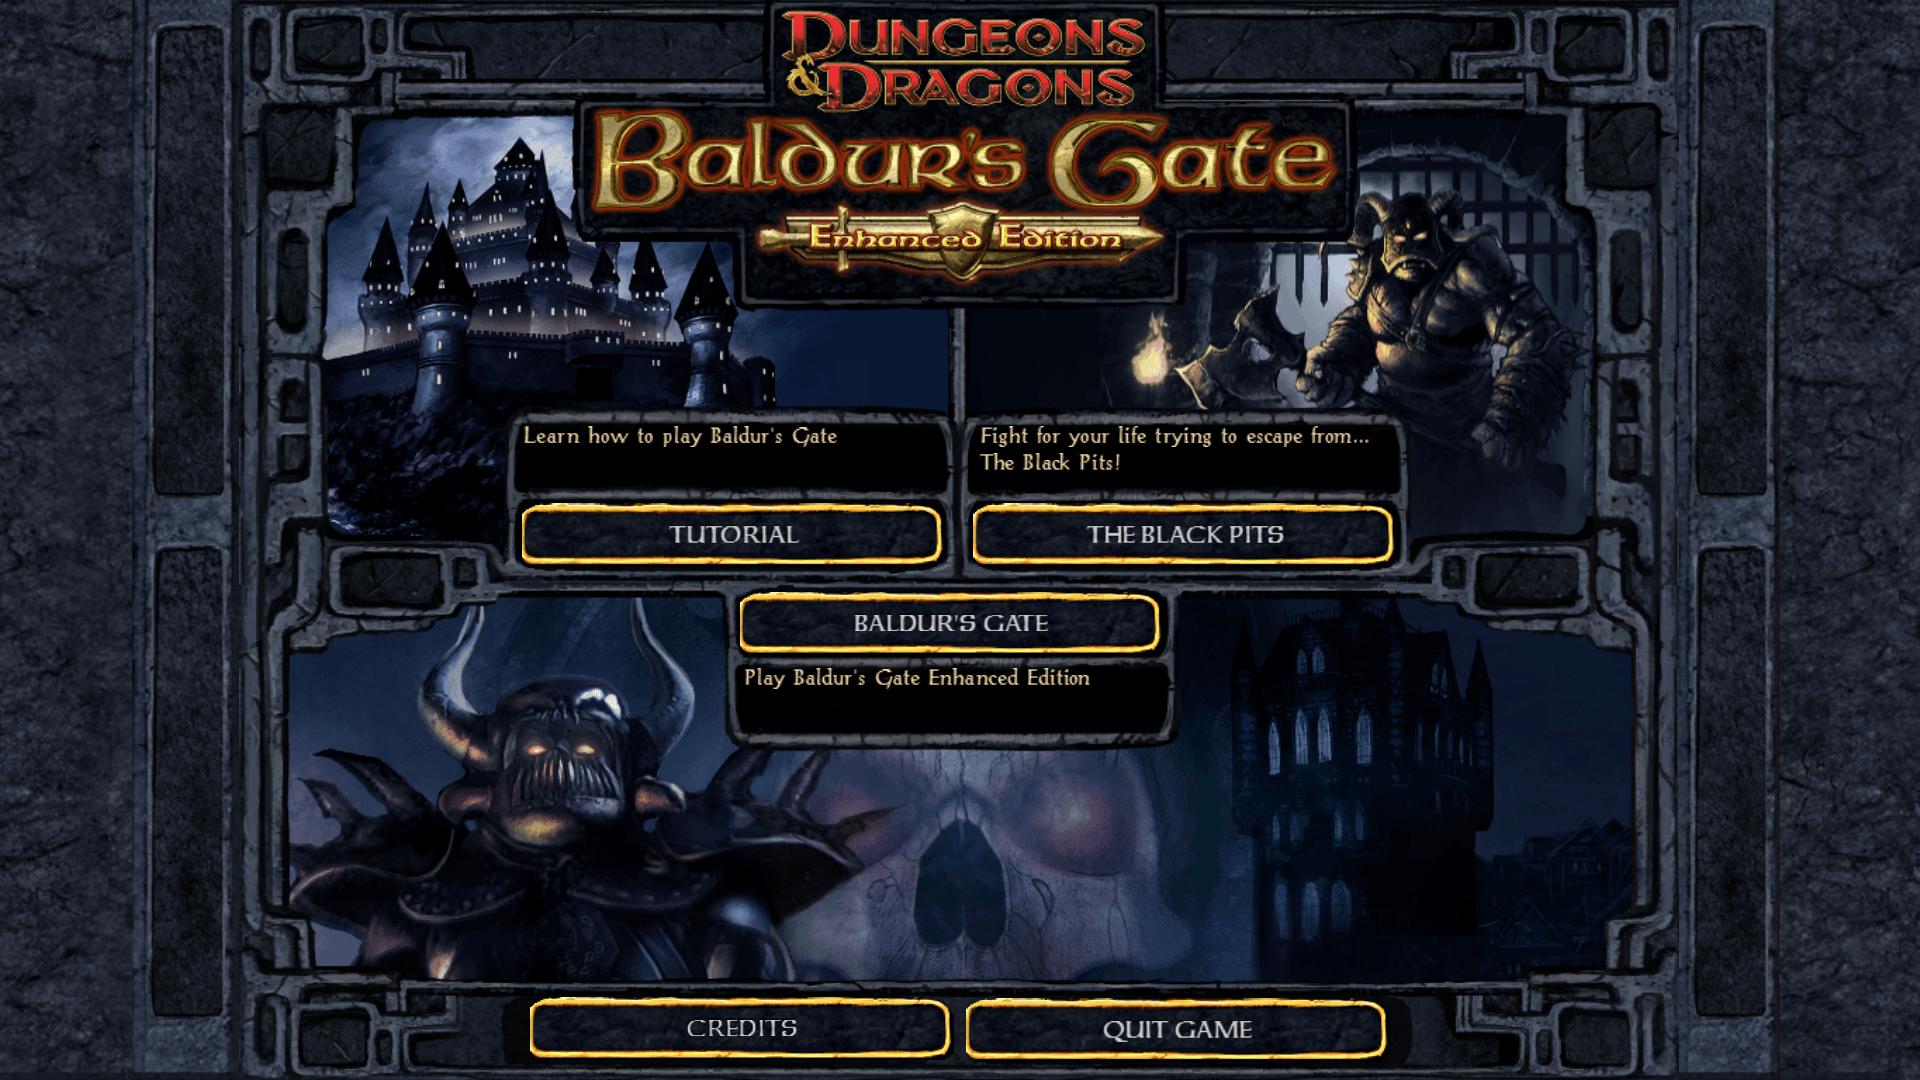 baldurs-gate